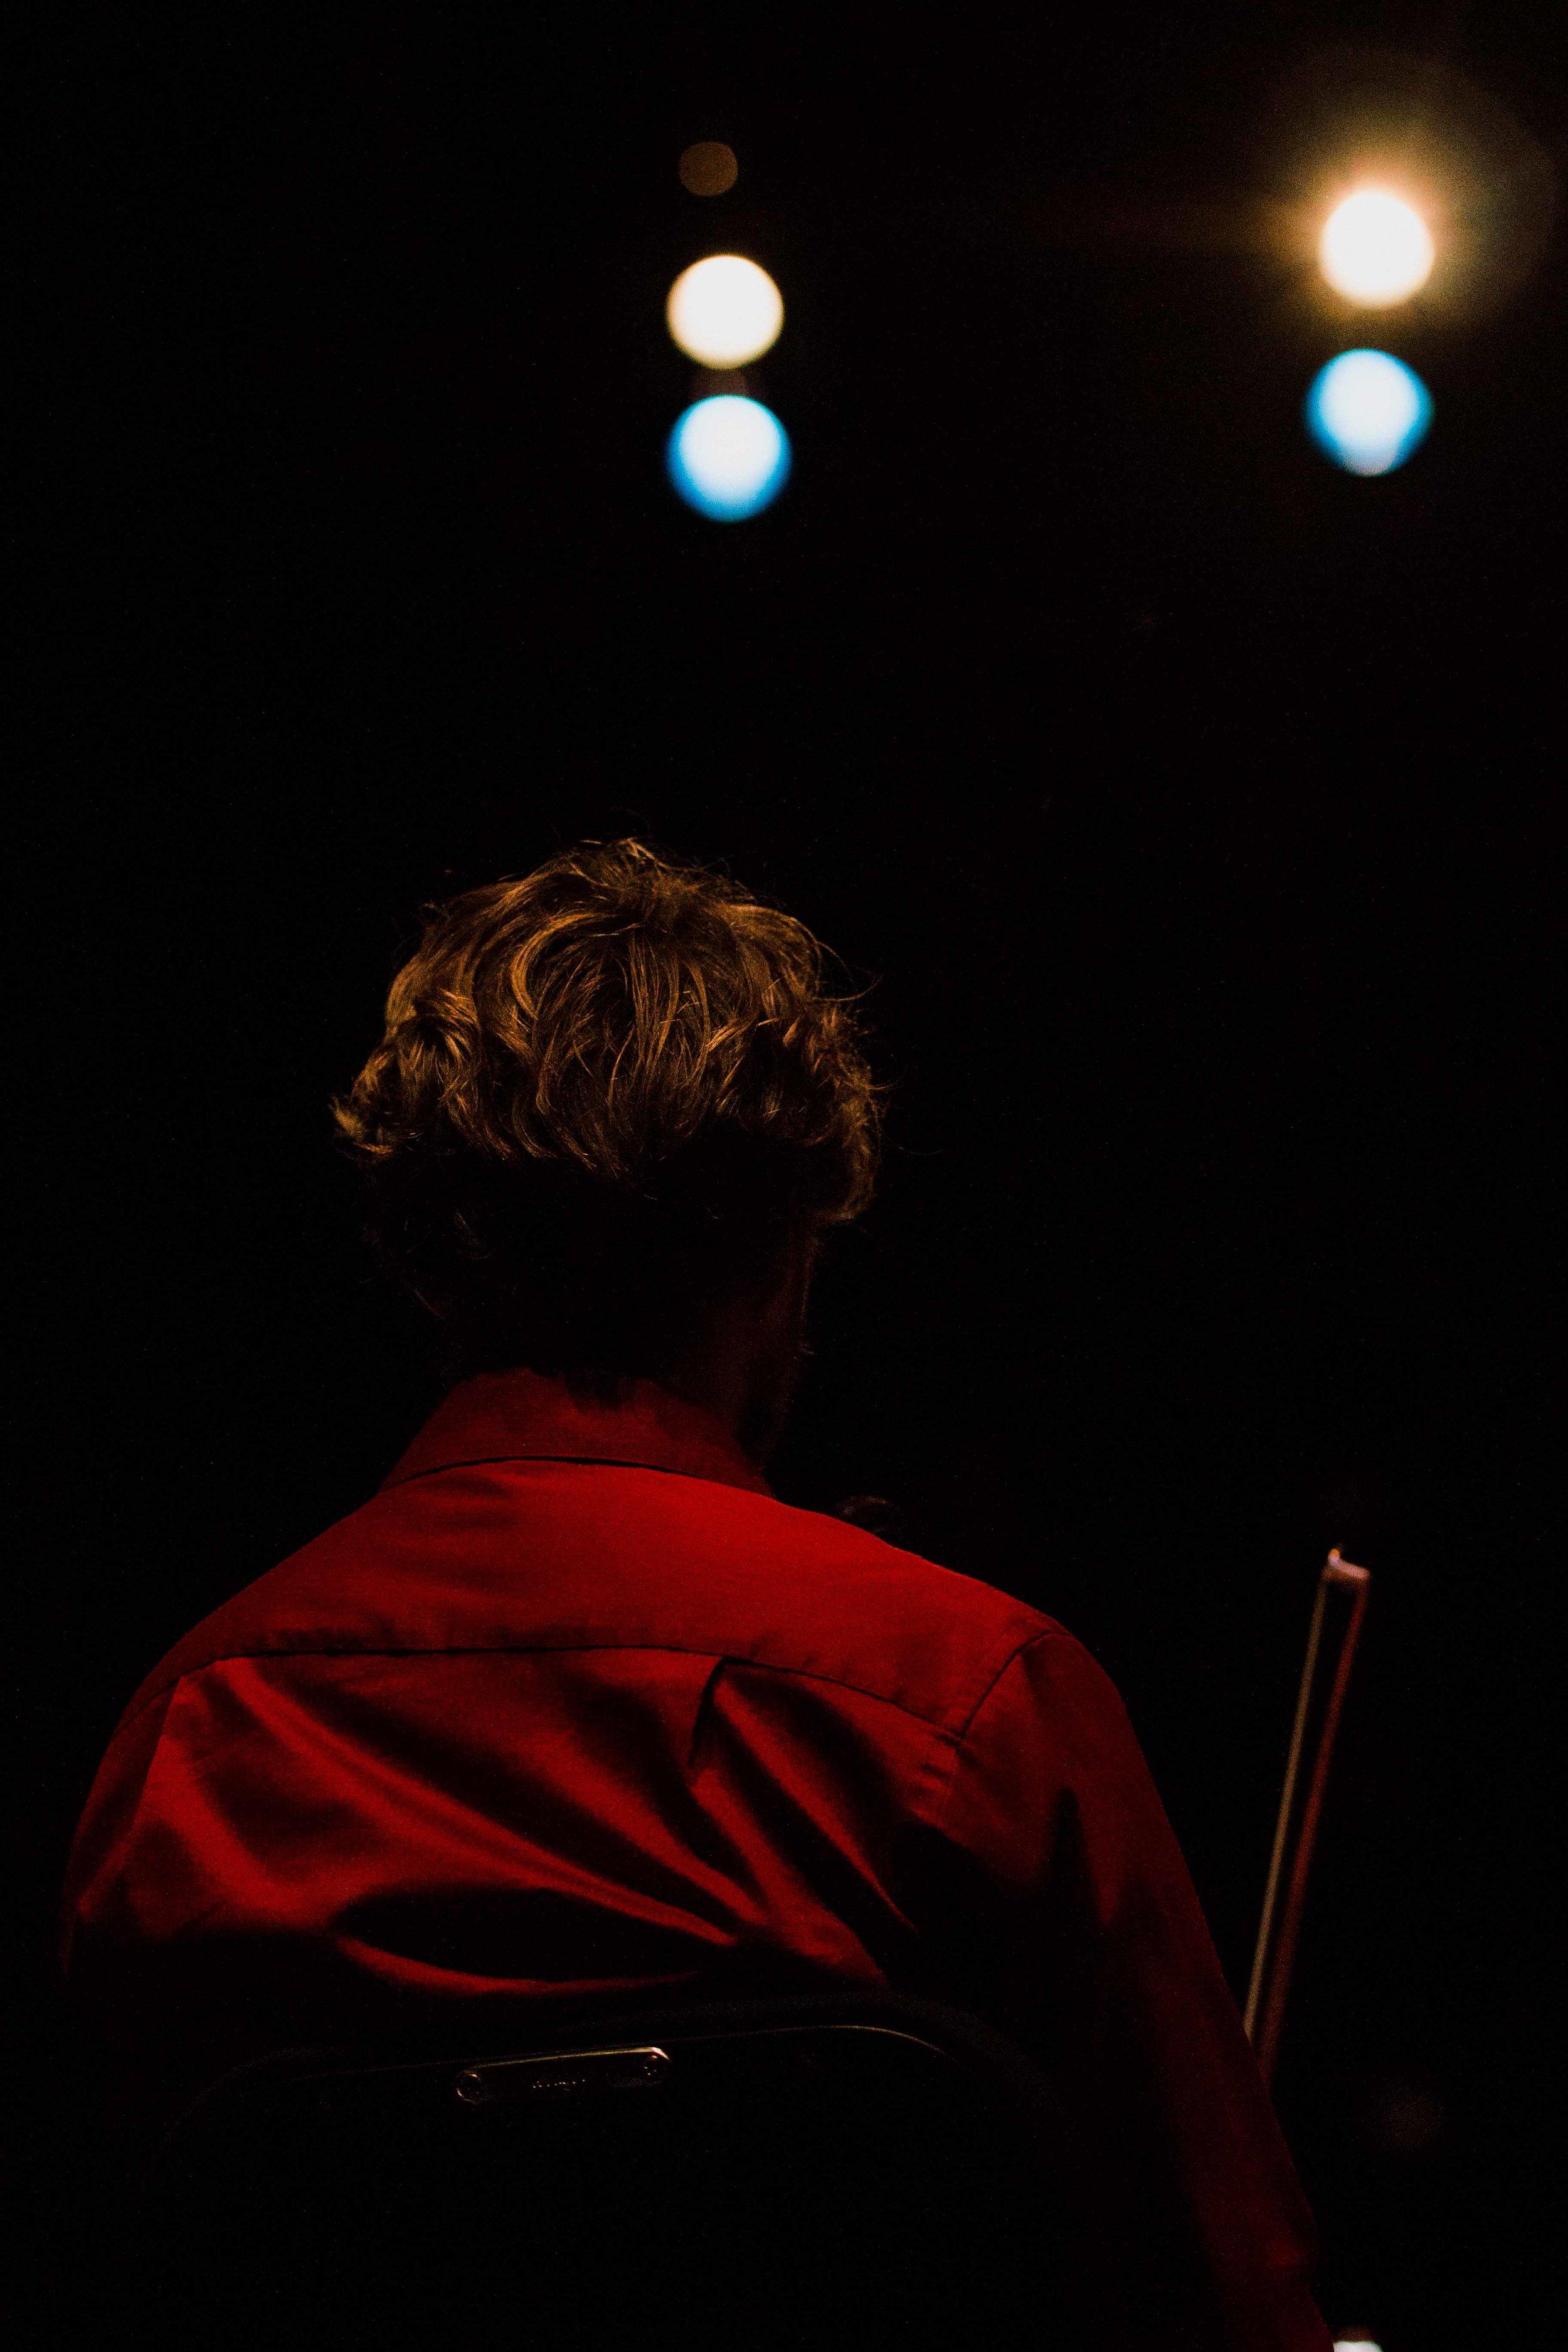 Saman-Shariati-Plastic-Acid-Orchestra-Veda-Hille-23.jpg